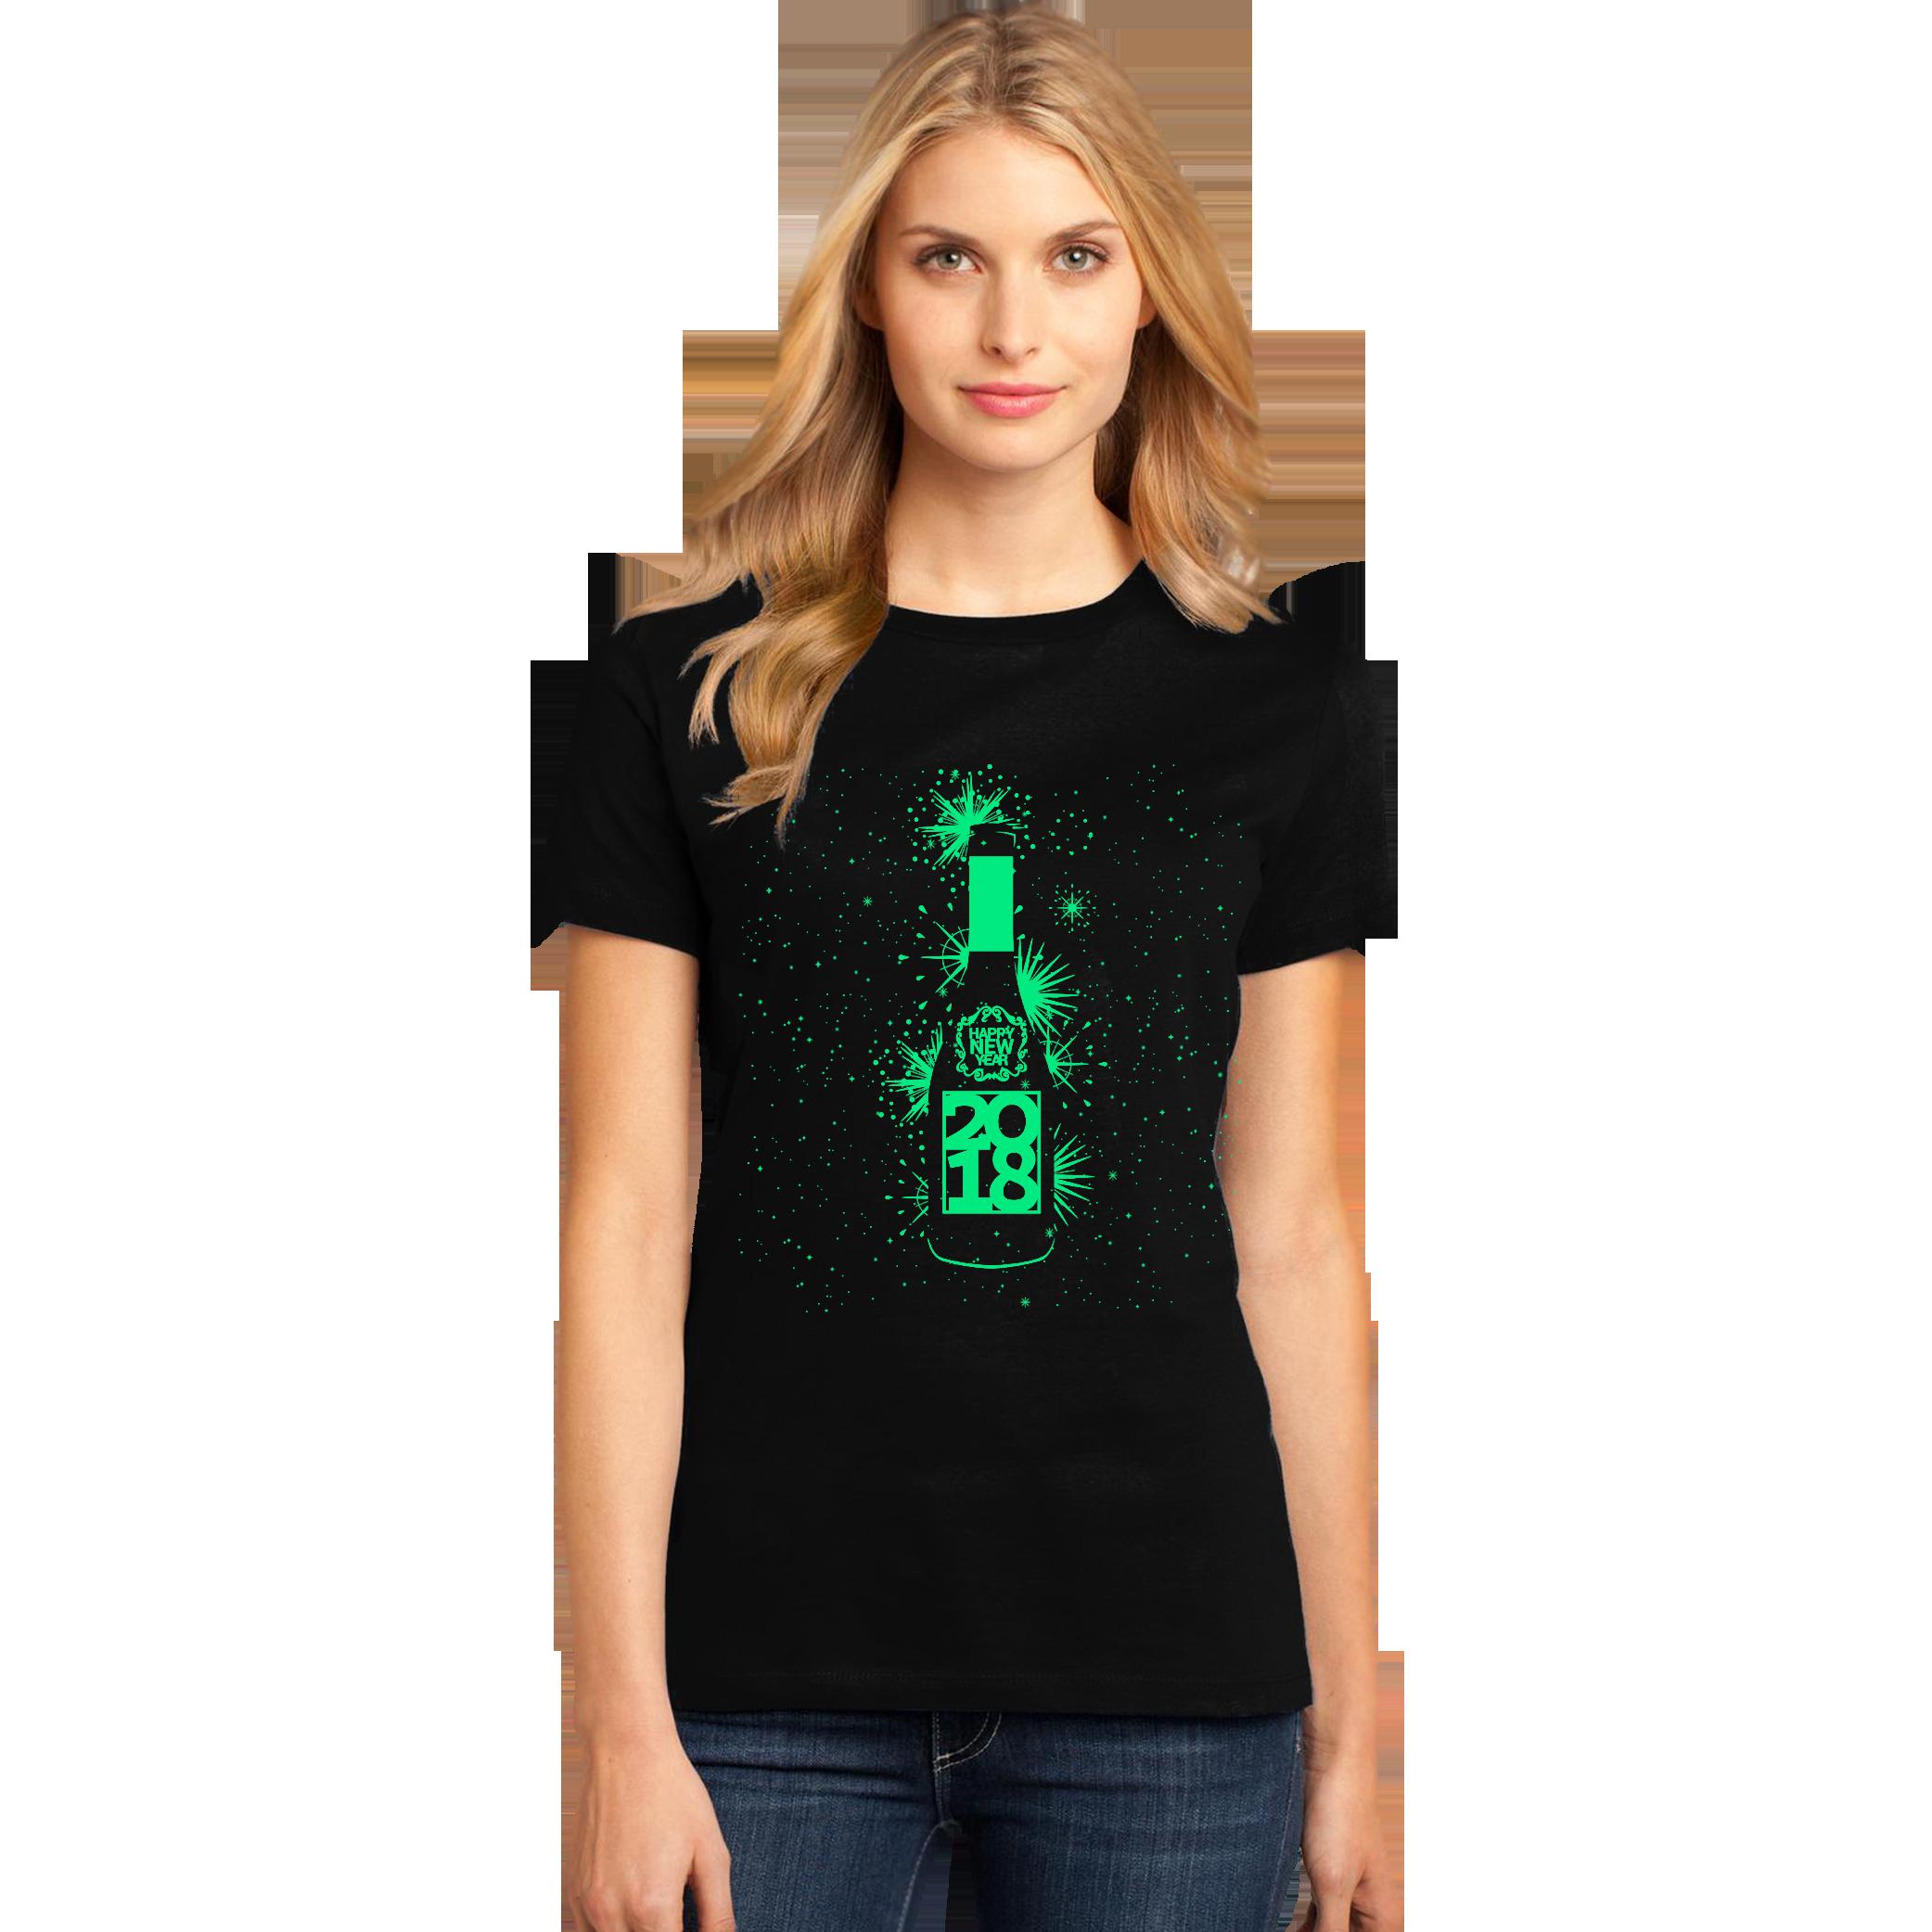 b82b7eda36ba Women s Glow In The Dark T-shirt